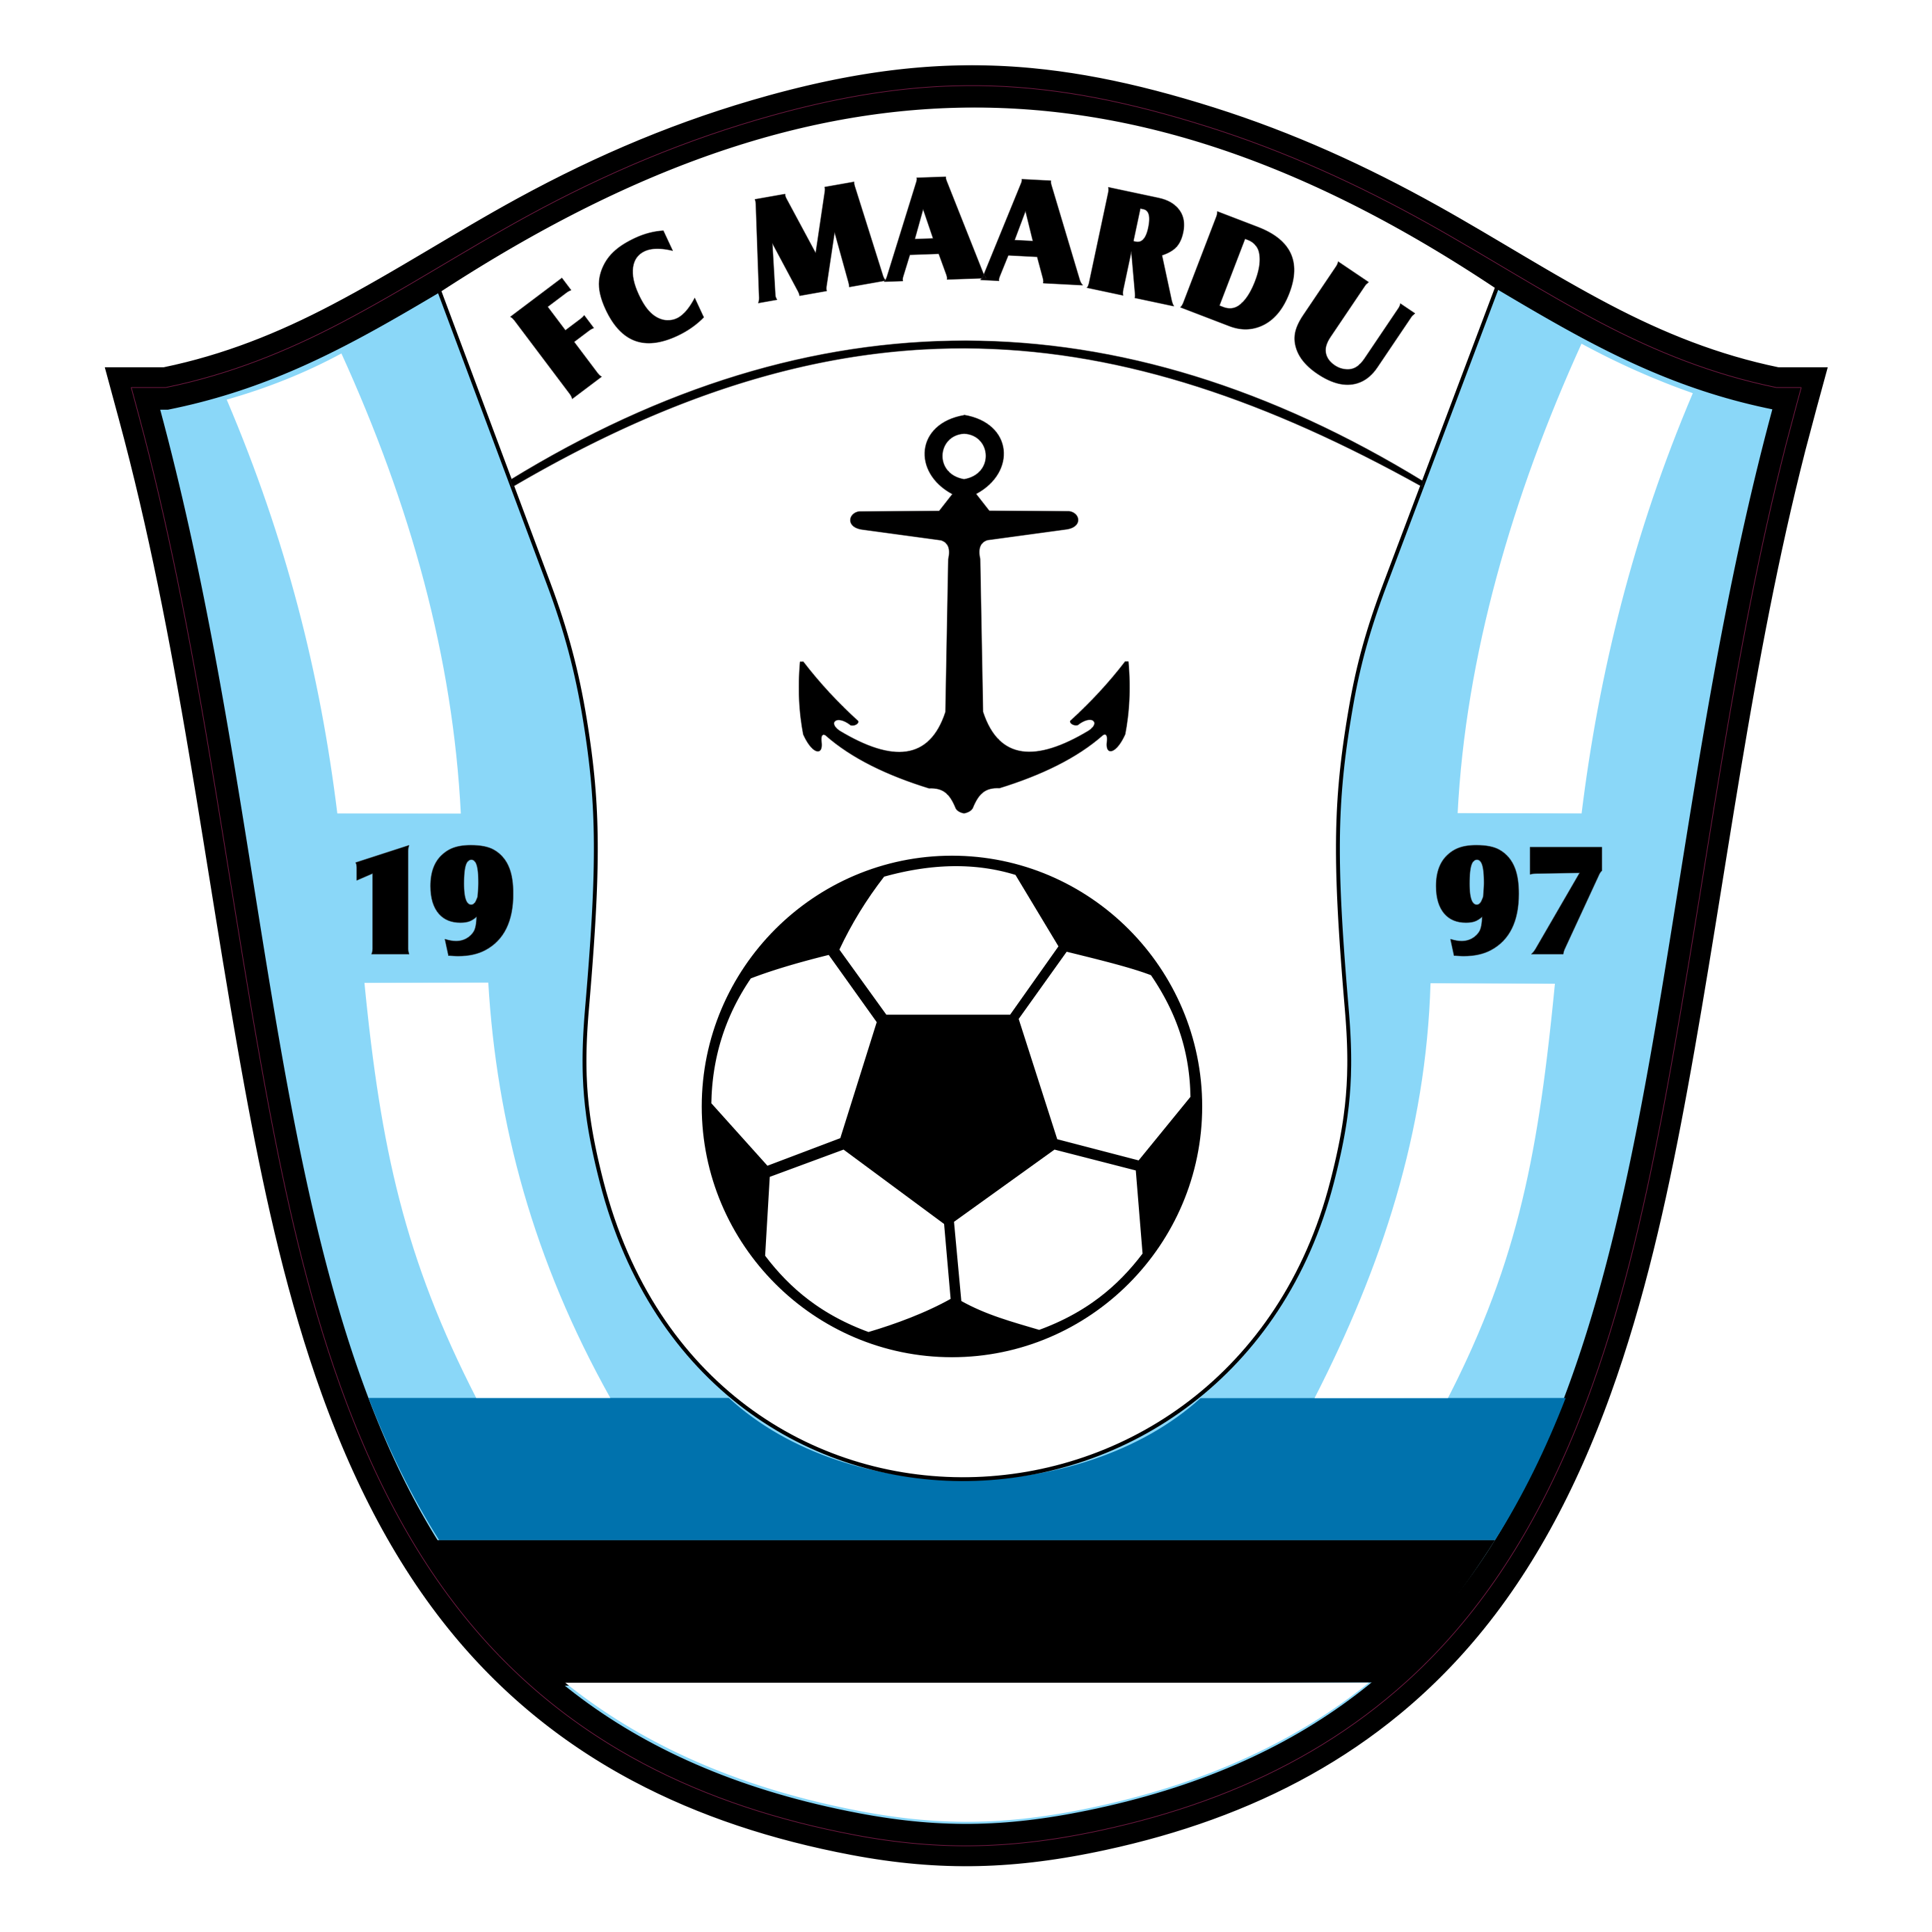 S. FC Starbunker Maardu